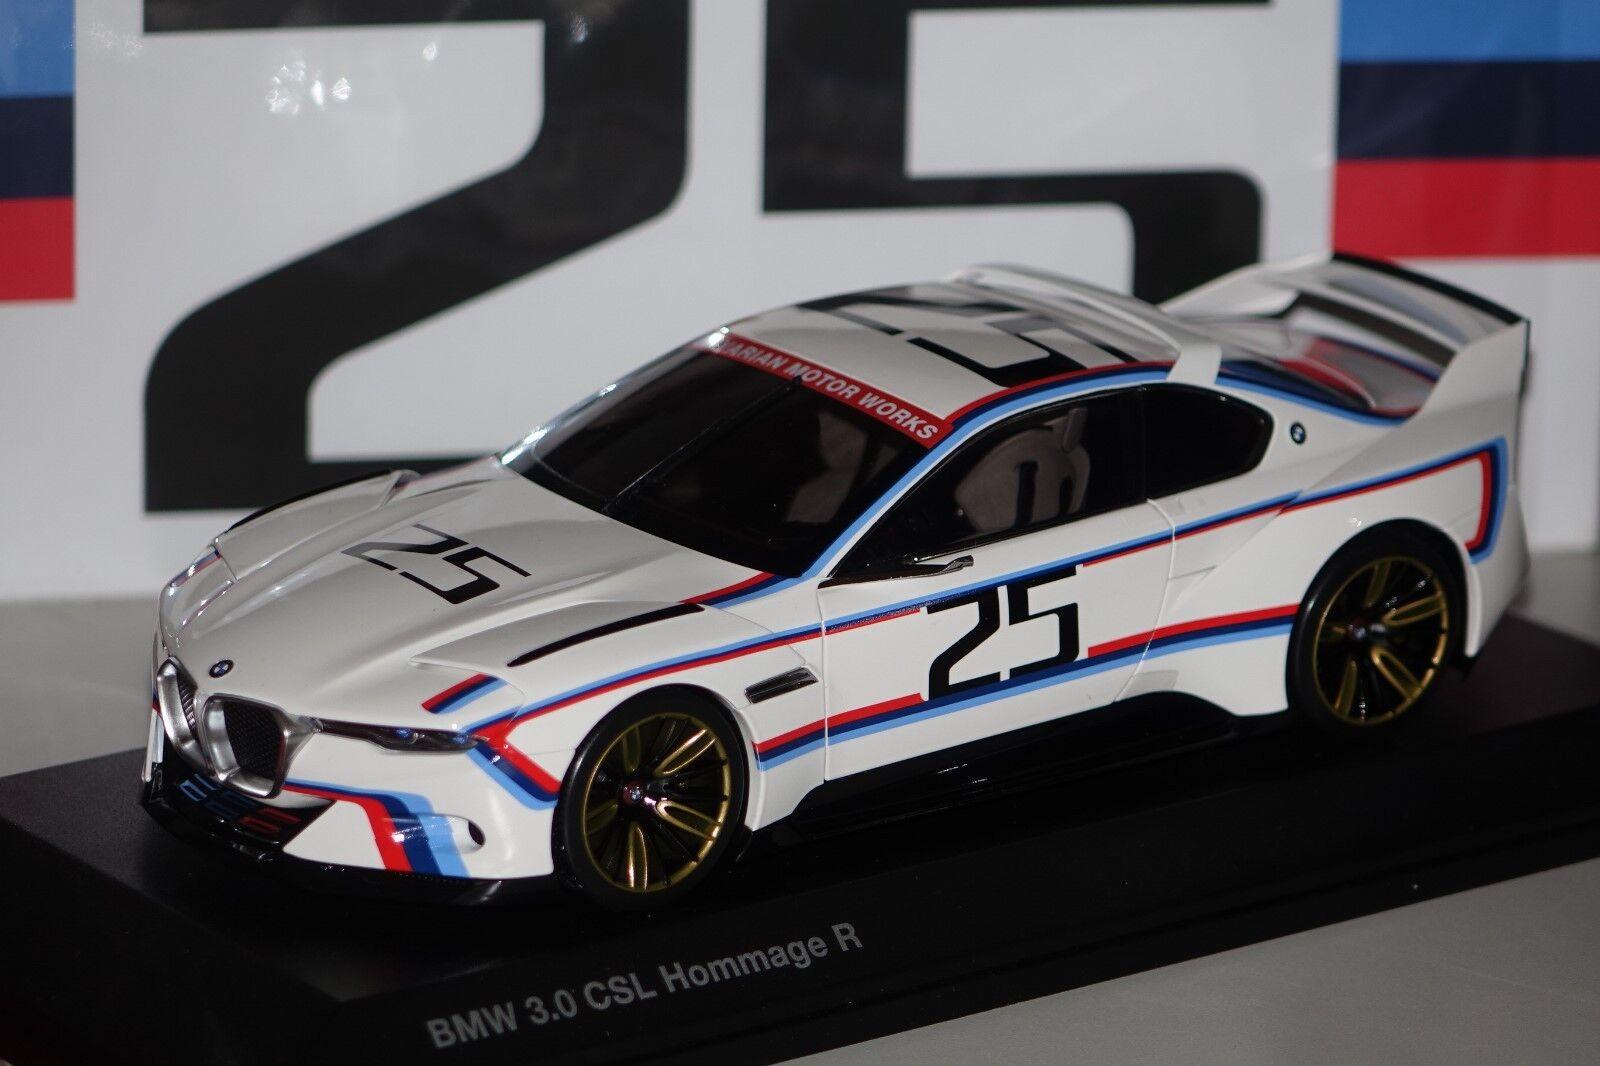 BMW 3,0 CSL R Hommage Blanc  25 1 18 BMW 80432454782 NEUF + neuf dans sa boîte